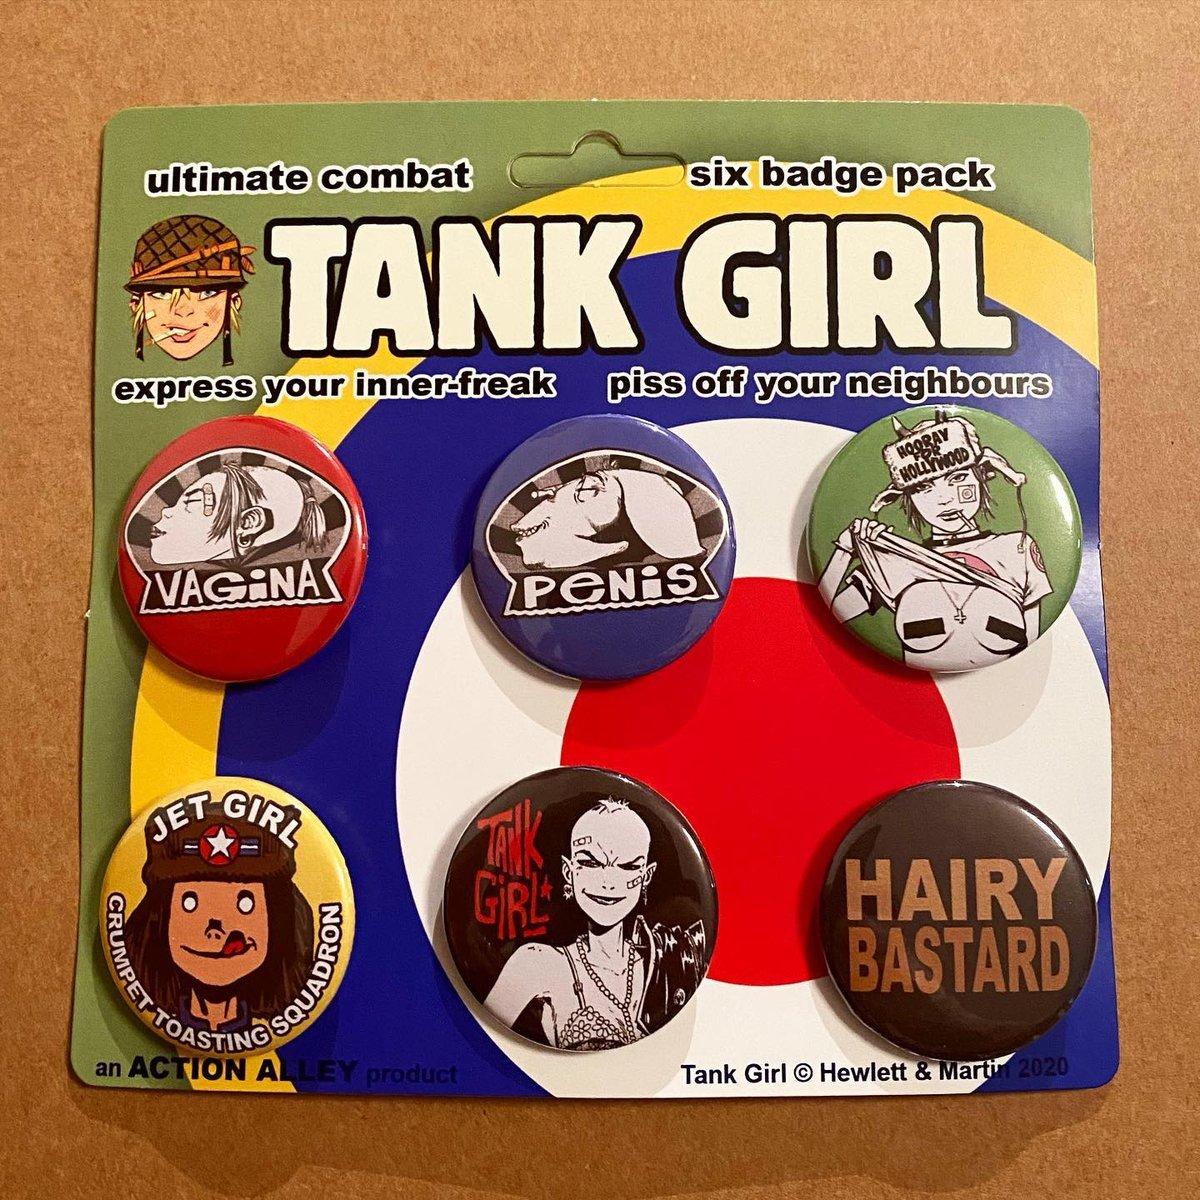 Image of TANK GIRL ULTIMATE COMBAT SIX BADGE PACK